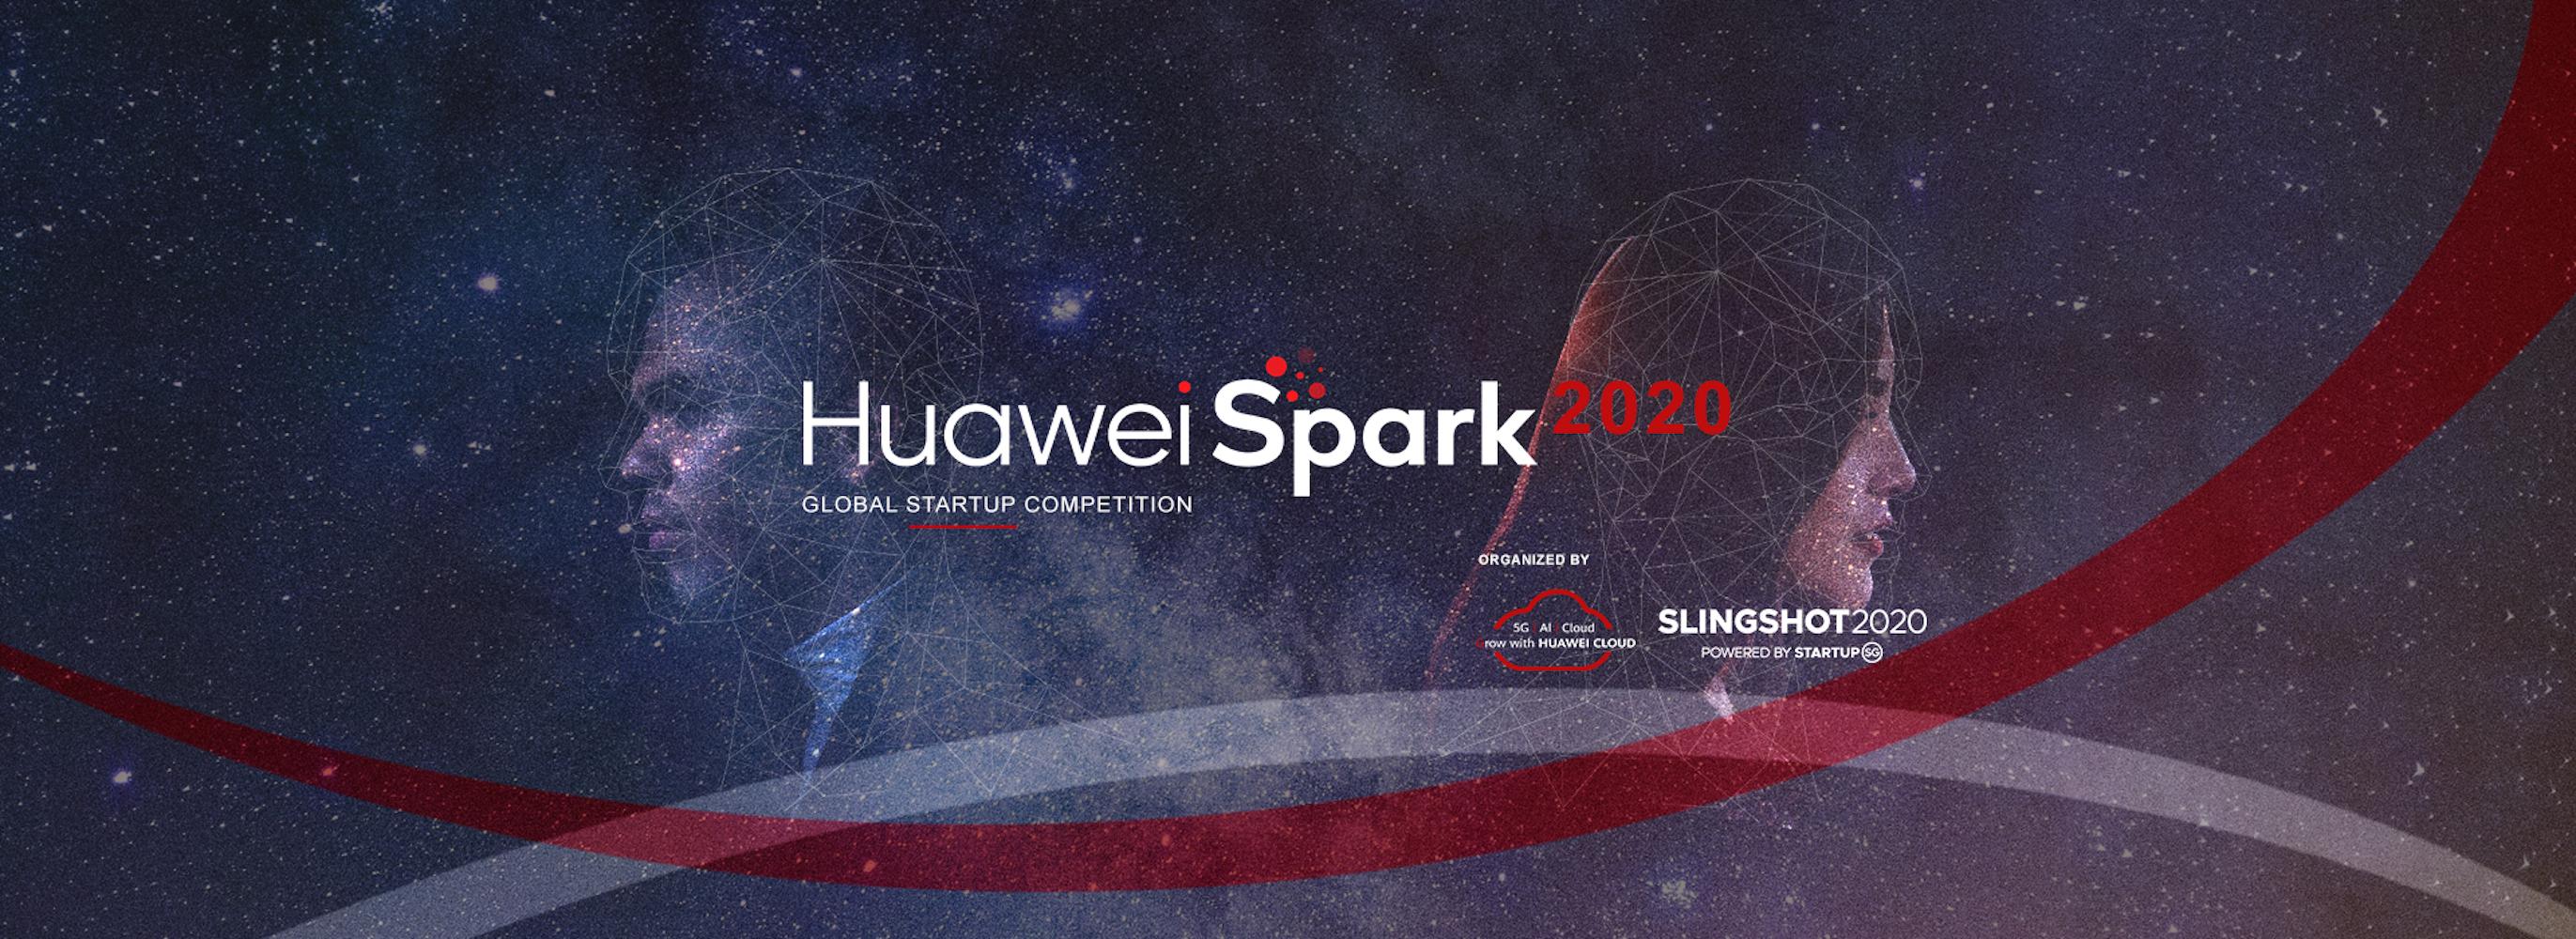 Huawei Spark 2020